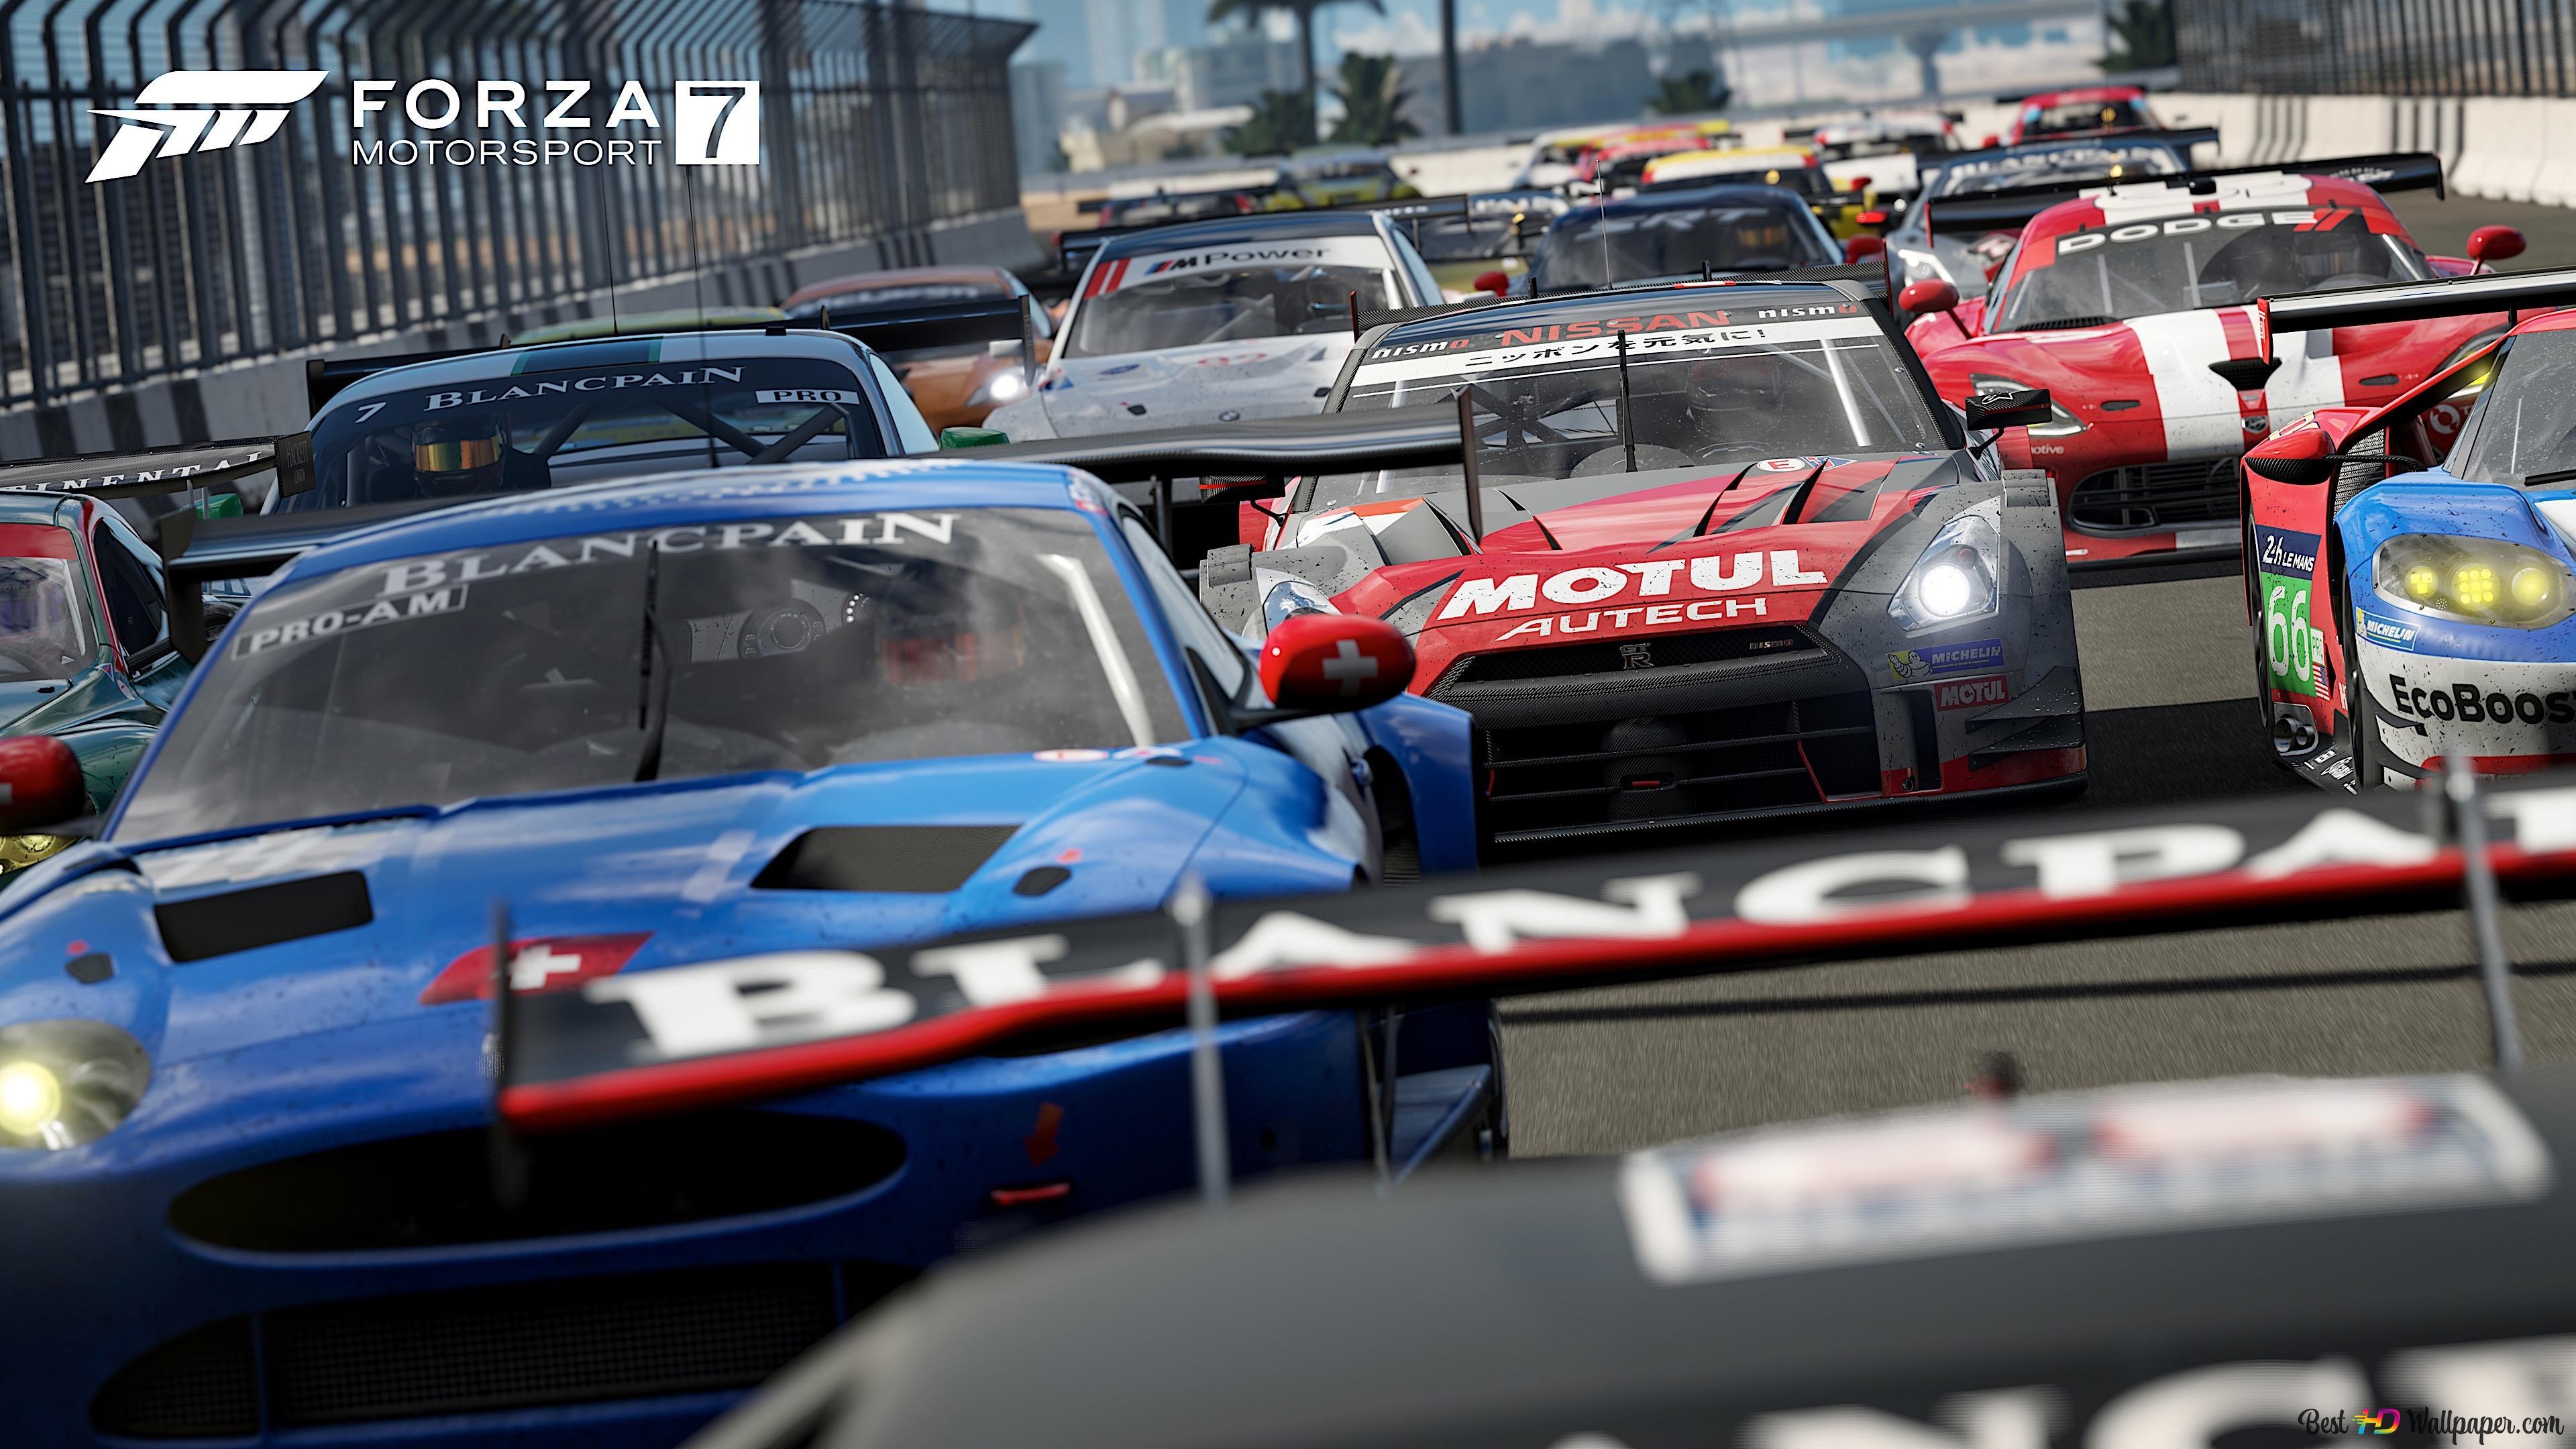 Forza Motorsport 7 Racing Sport Cars Hd Wallpaper Download